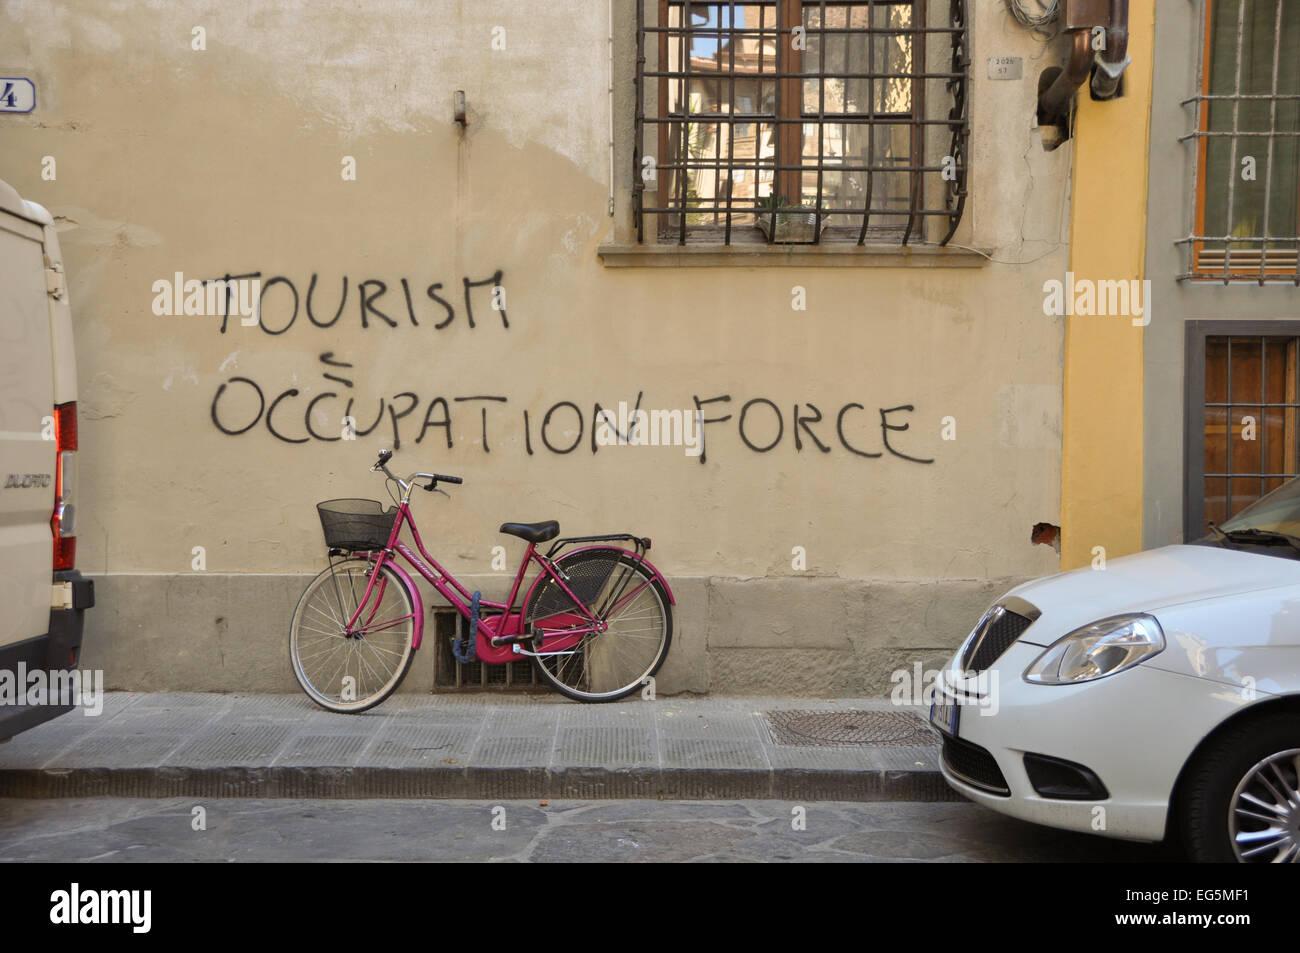 Tourisme anti graffiti sur mur en Florence Italie - Vélo rose ci-dessus Photo Stock